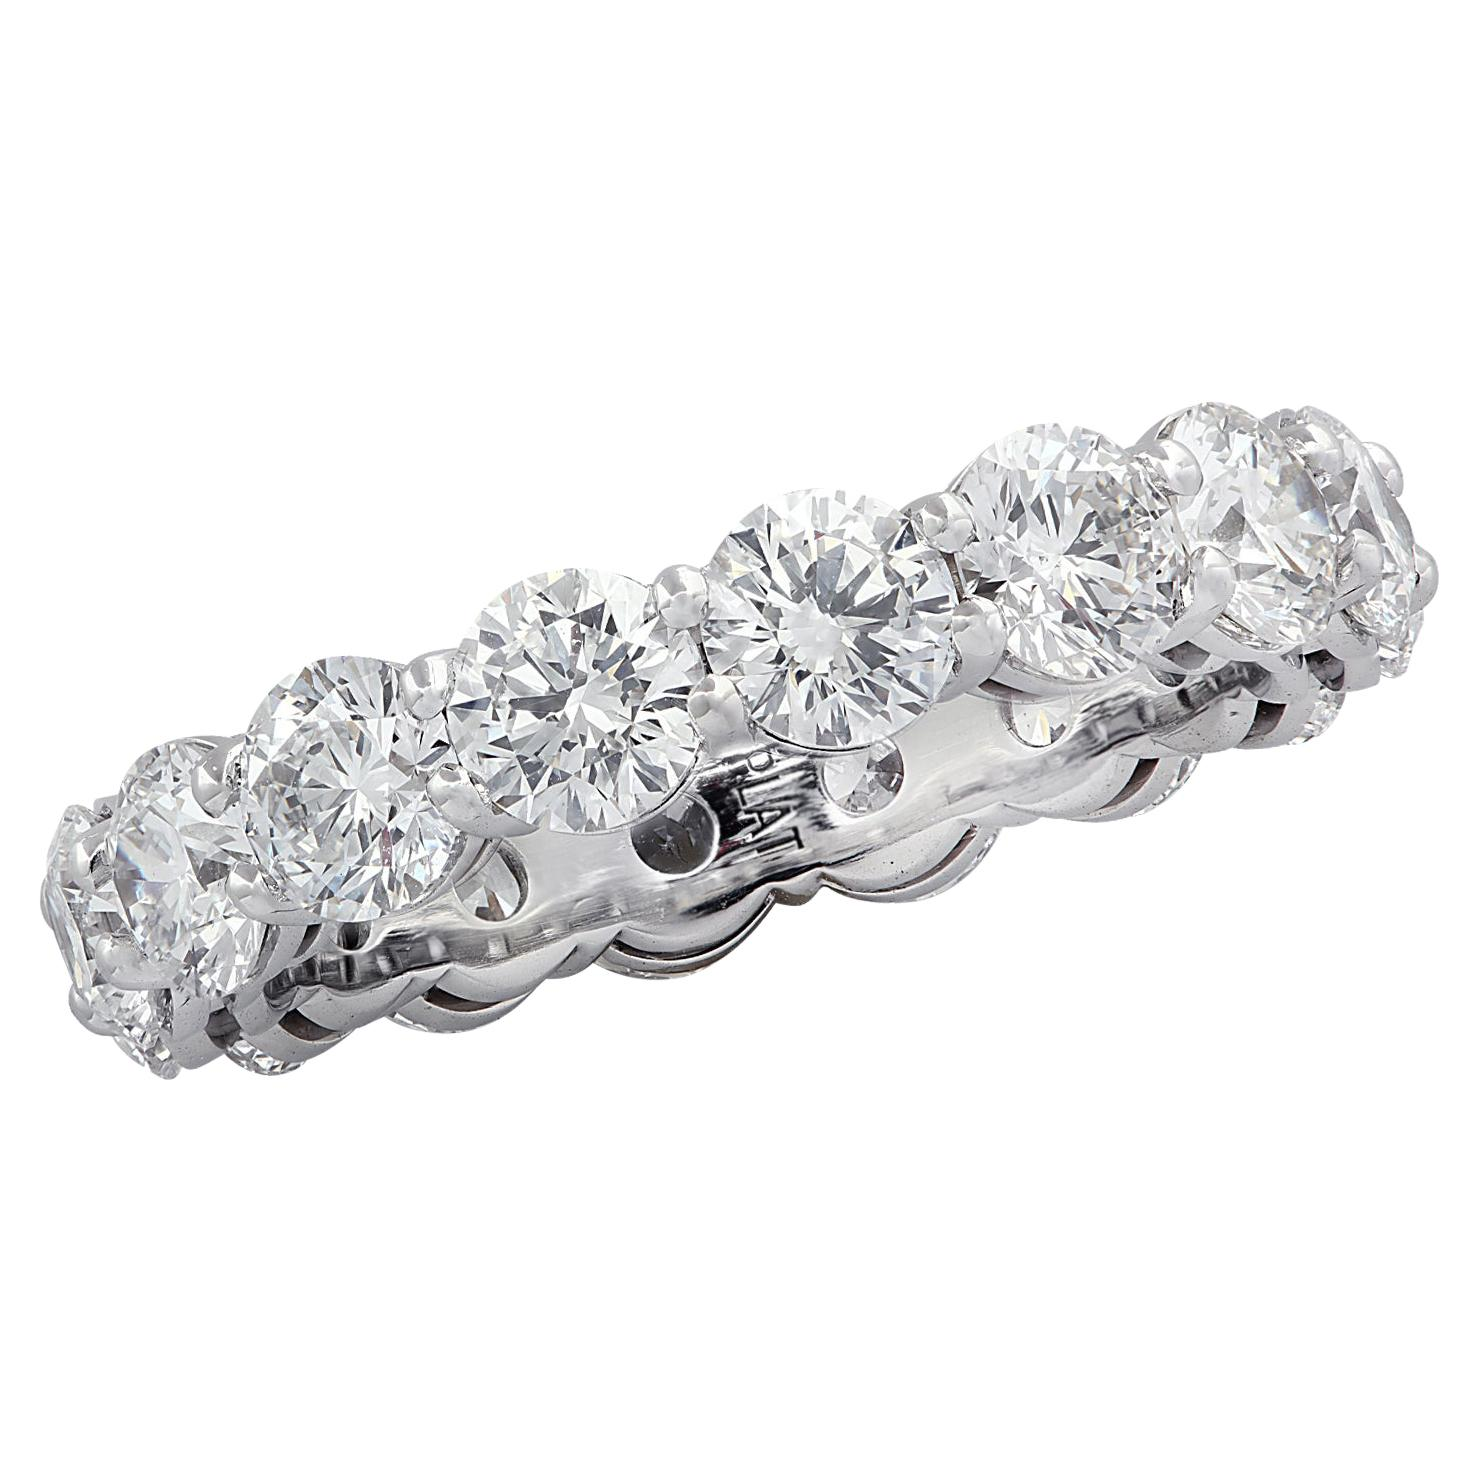 Vivid Diamonds 4.51 Carat Diamond Eternity Band